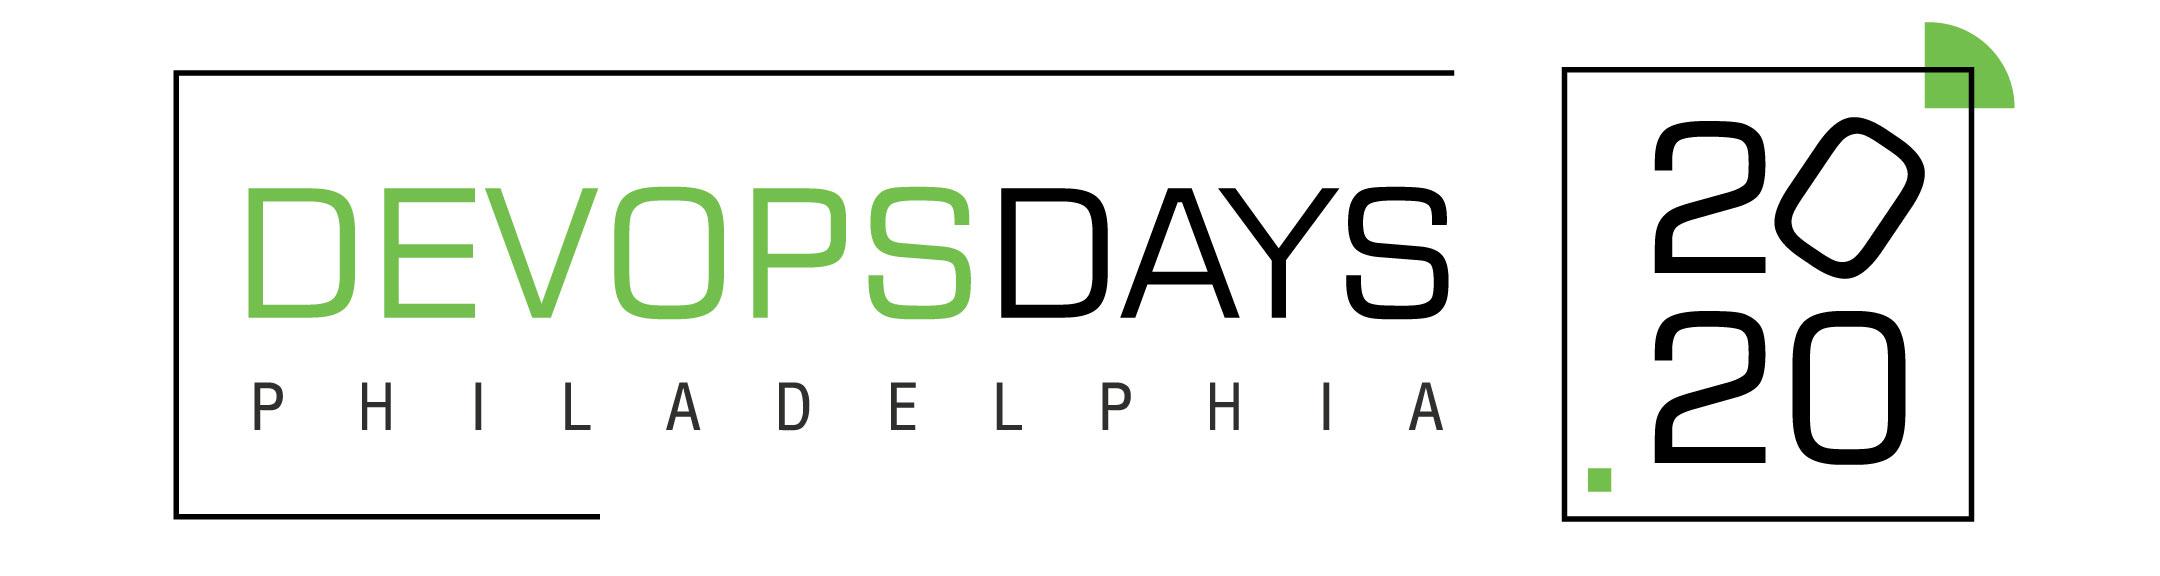 devopsdays Philadelphia 2020